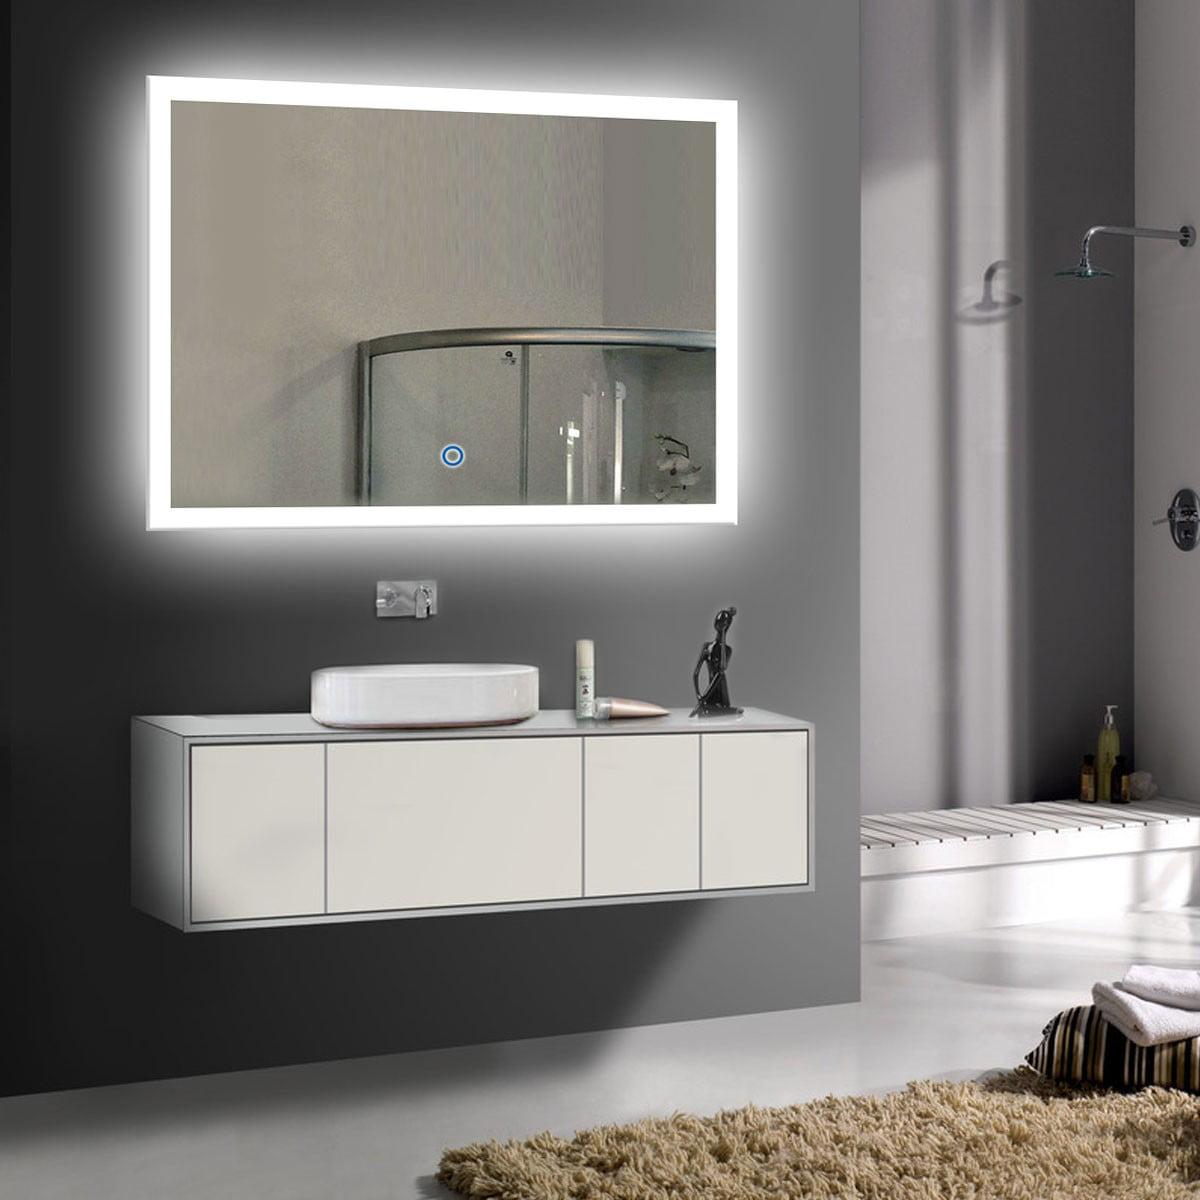 Decoraport 36 mirror for wall mirror modern bathroom vanity lights wall 36 x 28 inch n031 i